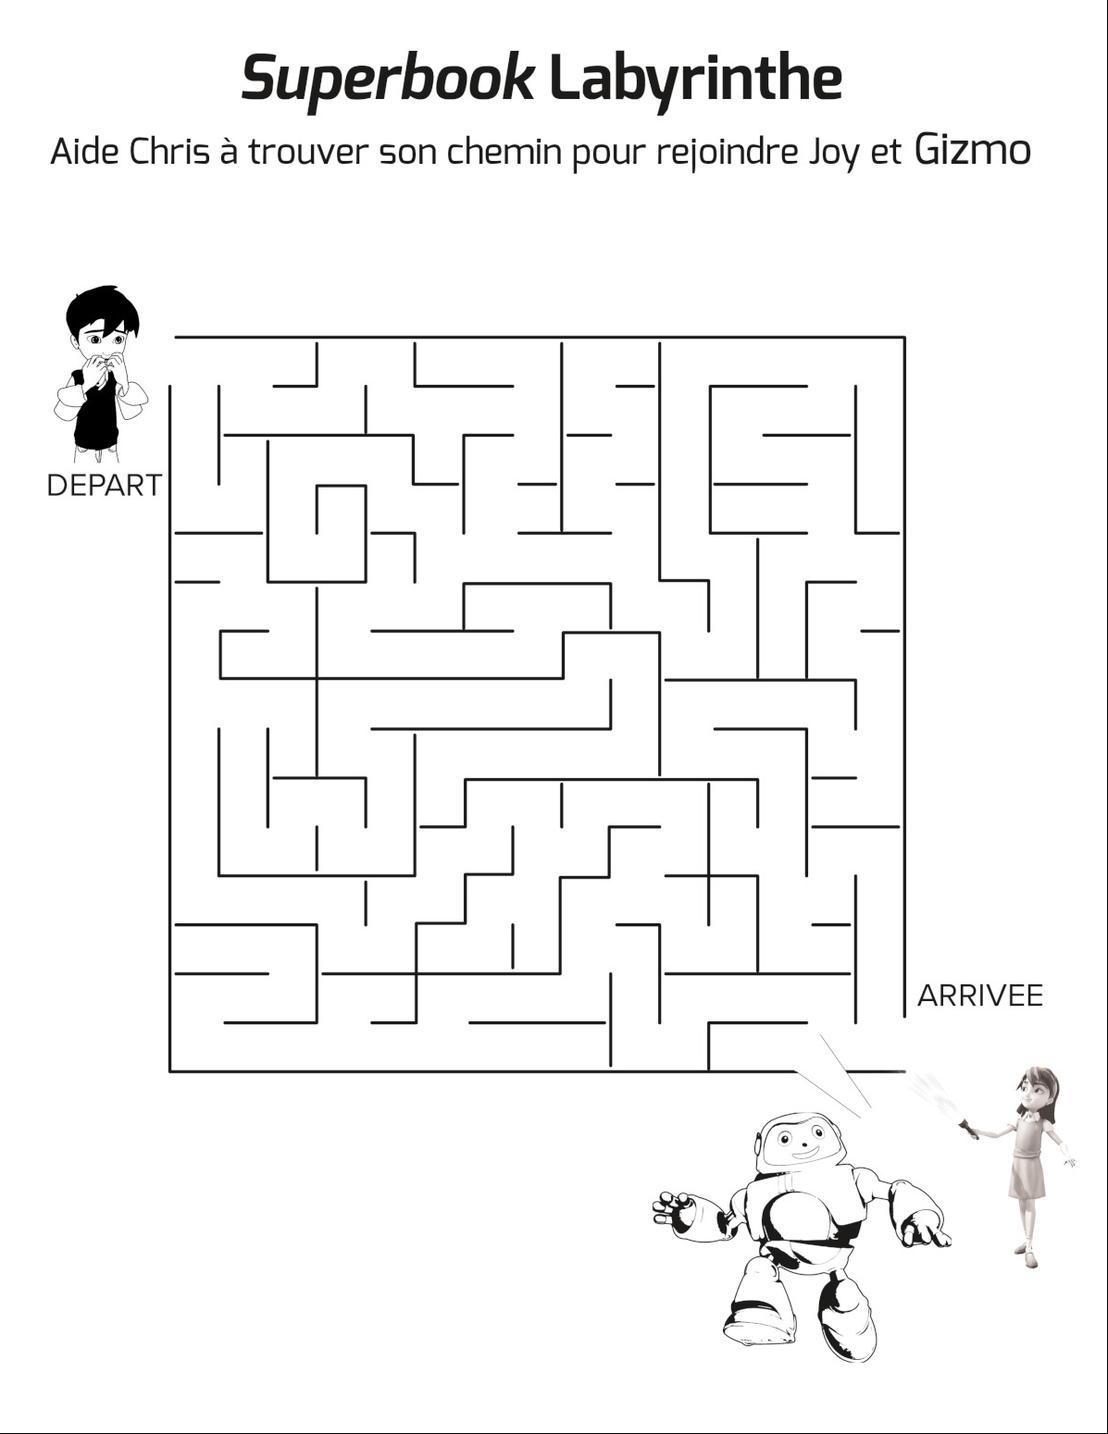 Superbook Labyrinthe De Superbook - Gizmo - Jeu À Imprimer tout Labyrinthe A Imprimer